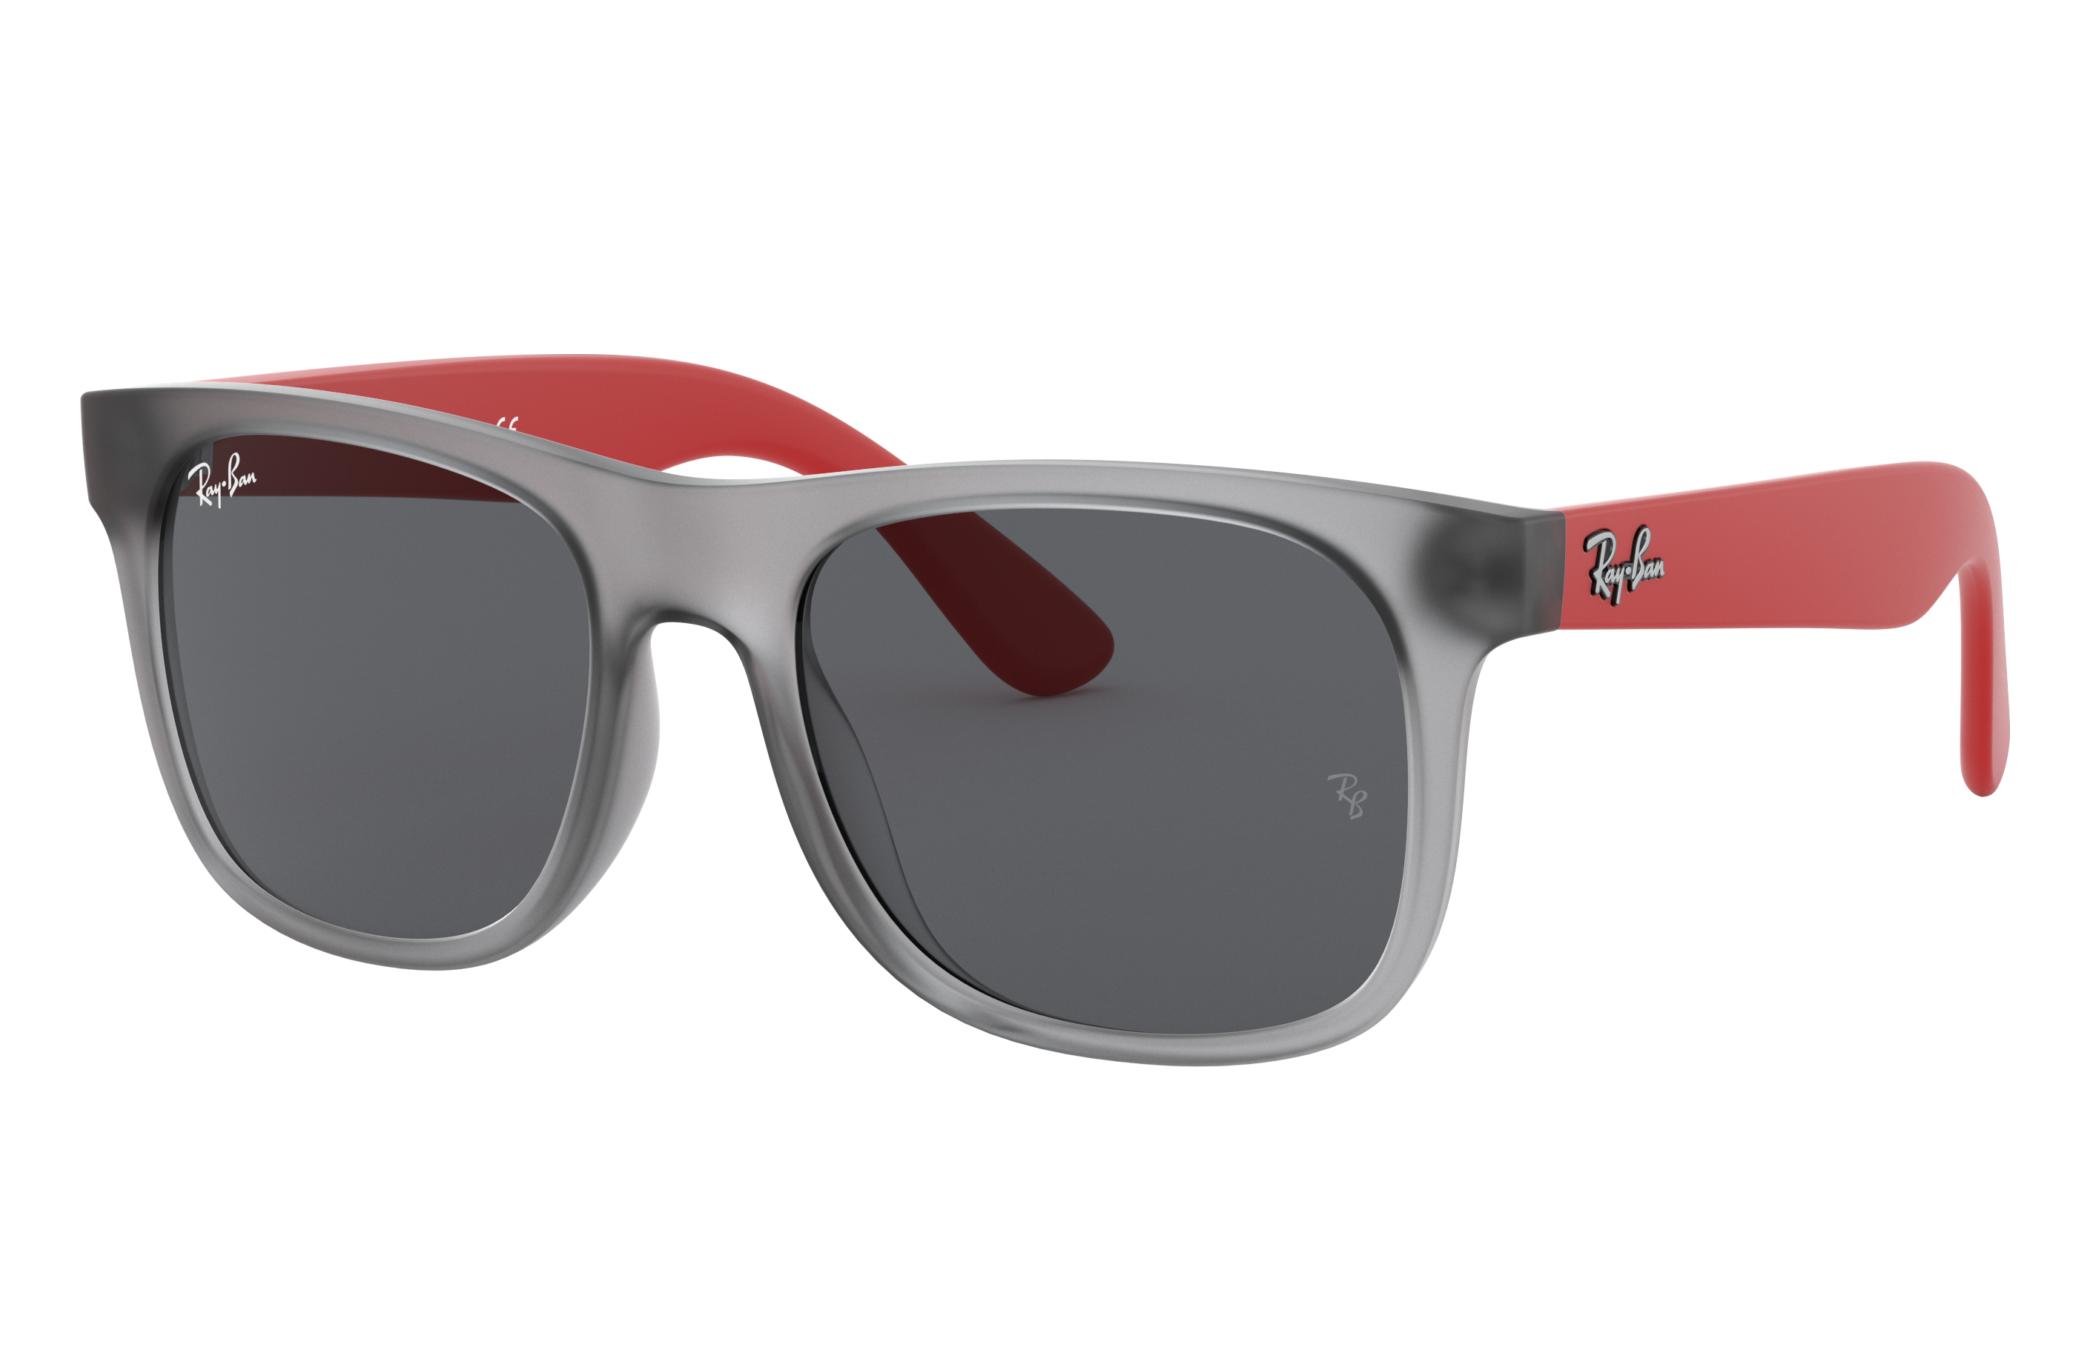 Ray-Ban Rj9069s Rubber Red, Grey Lenses - RJ9069S